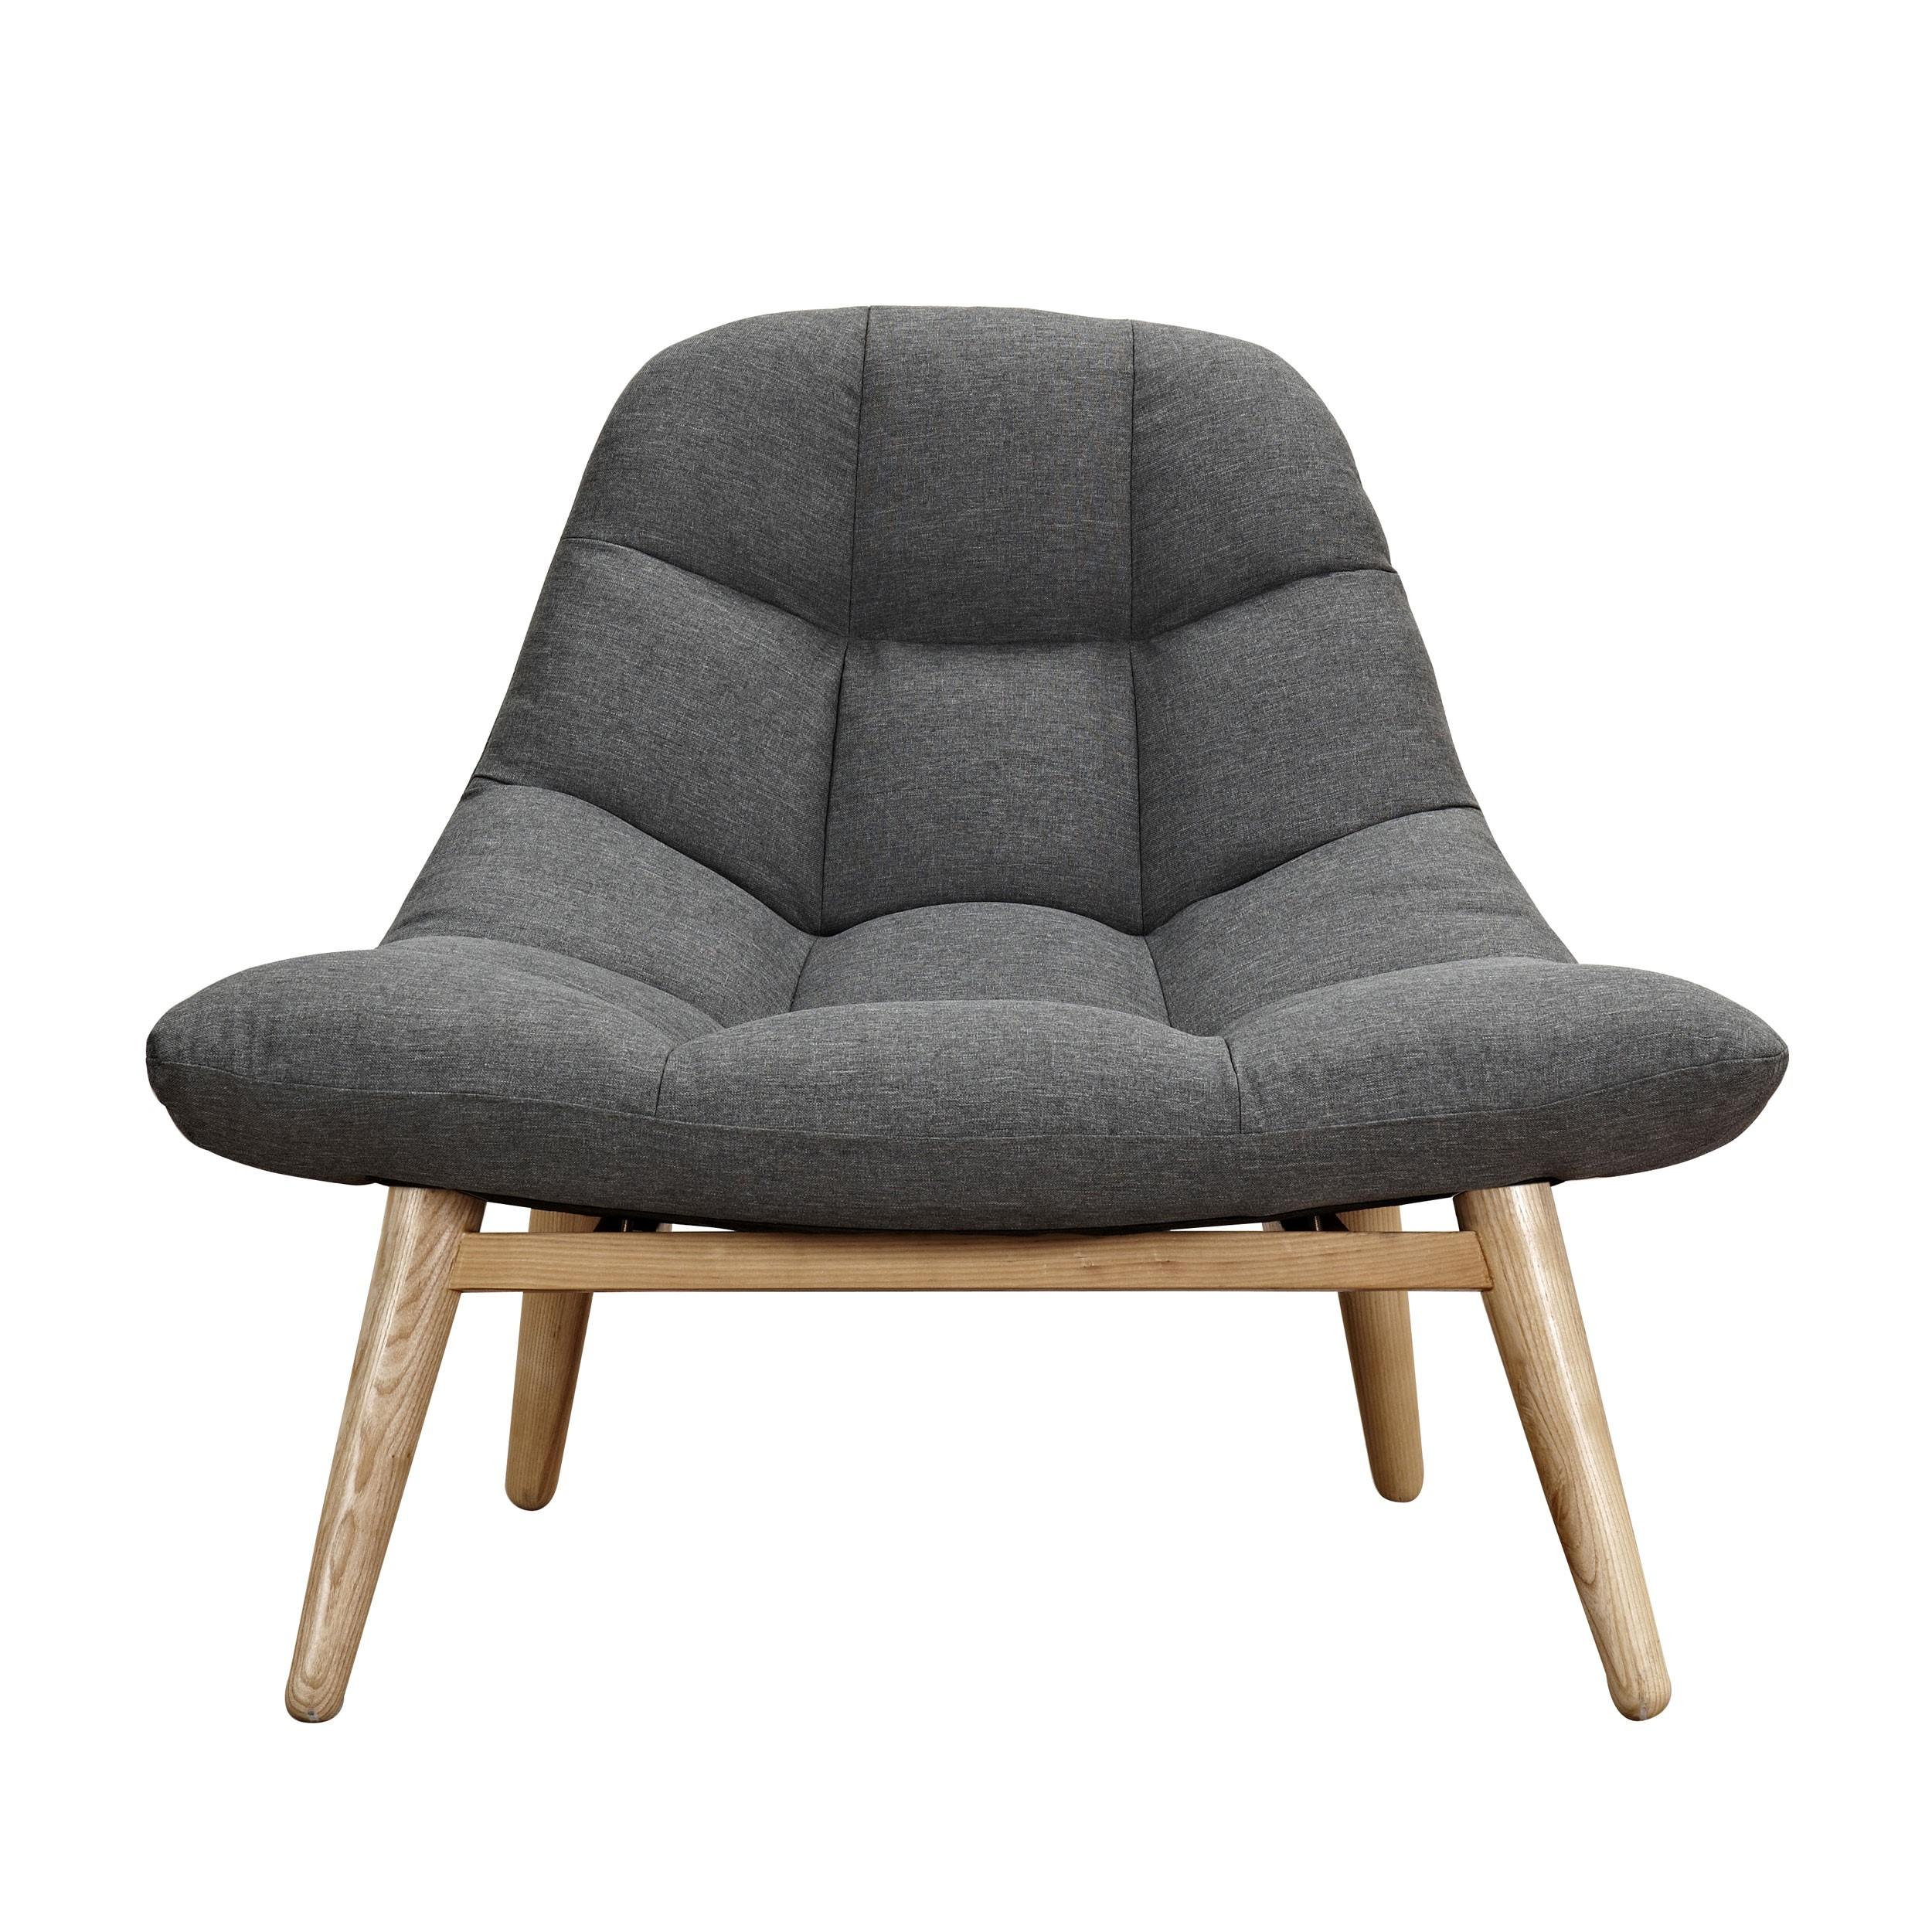 Fauteuil Melby gris anthracite adopez nos fauteuils